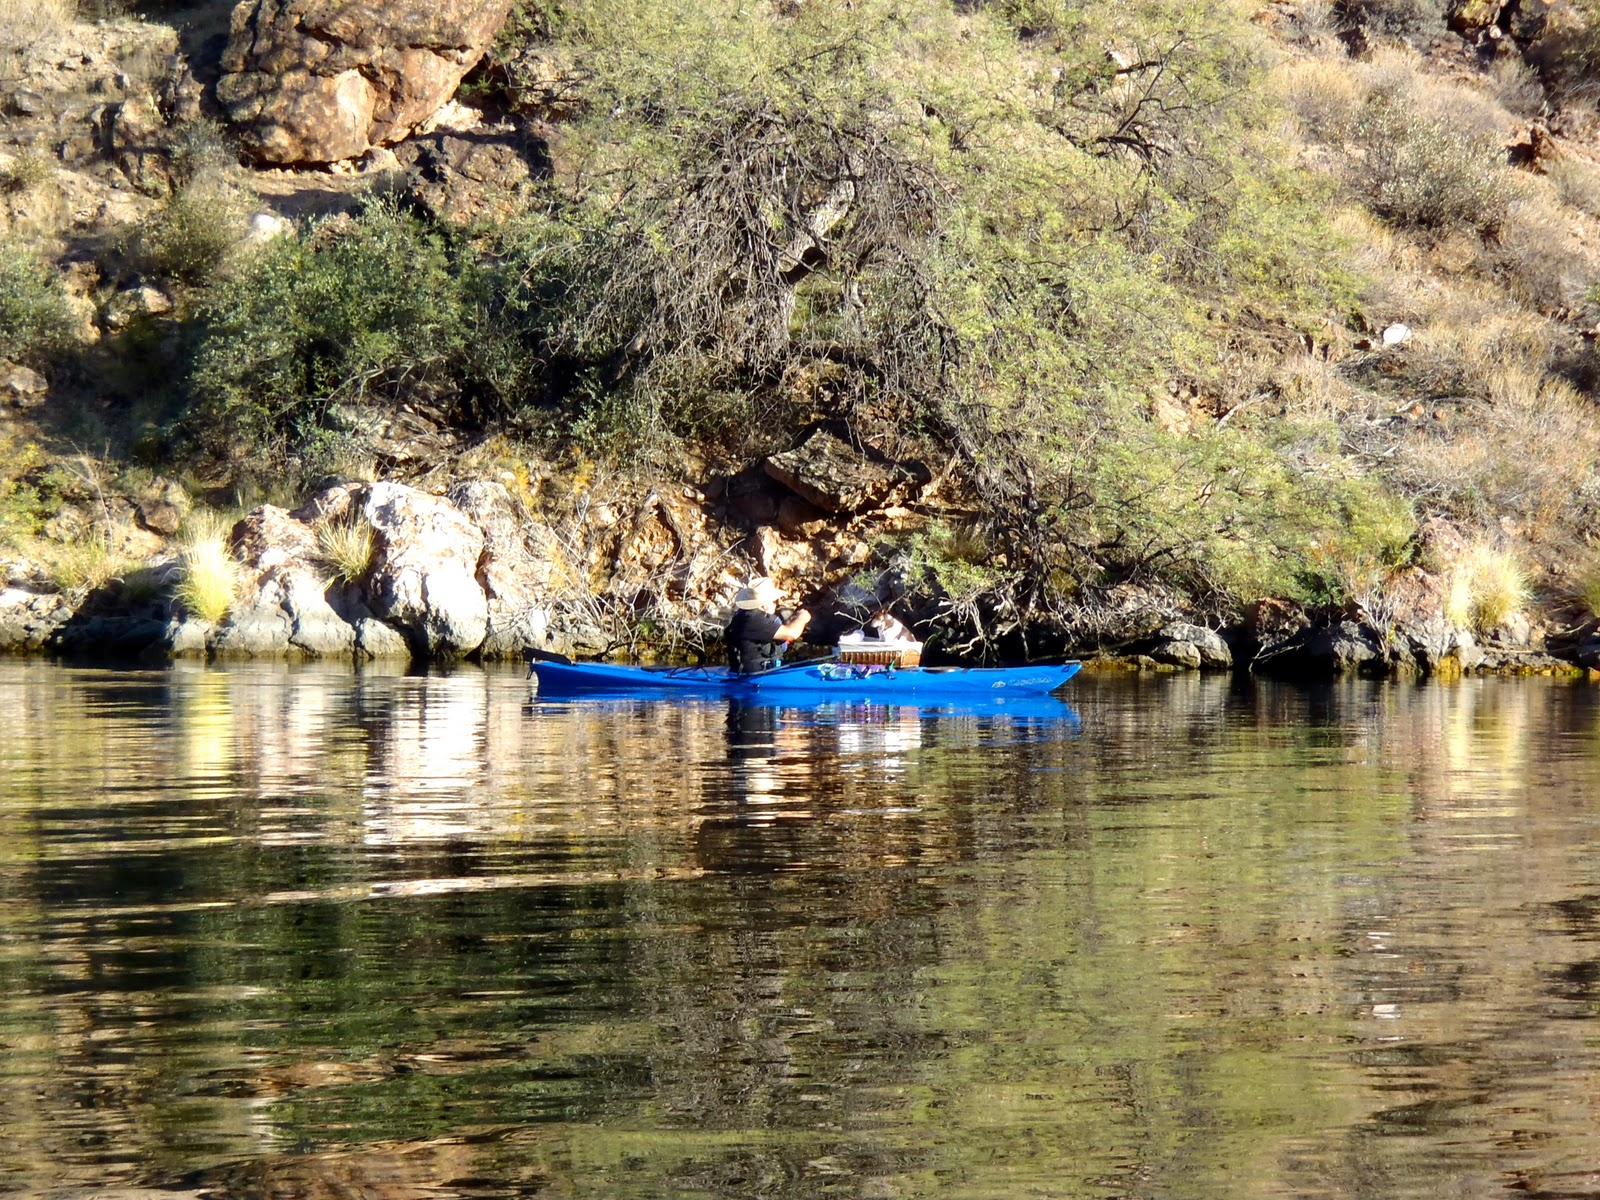 Live2kayakfish canyon lake a kayaker 39 s dream come true for Canyon lake az fishing